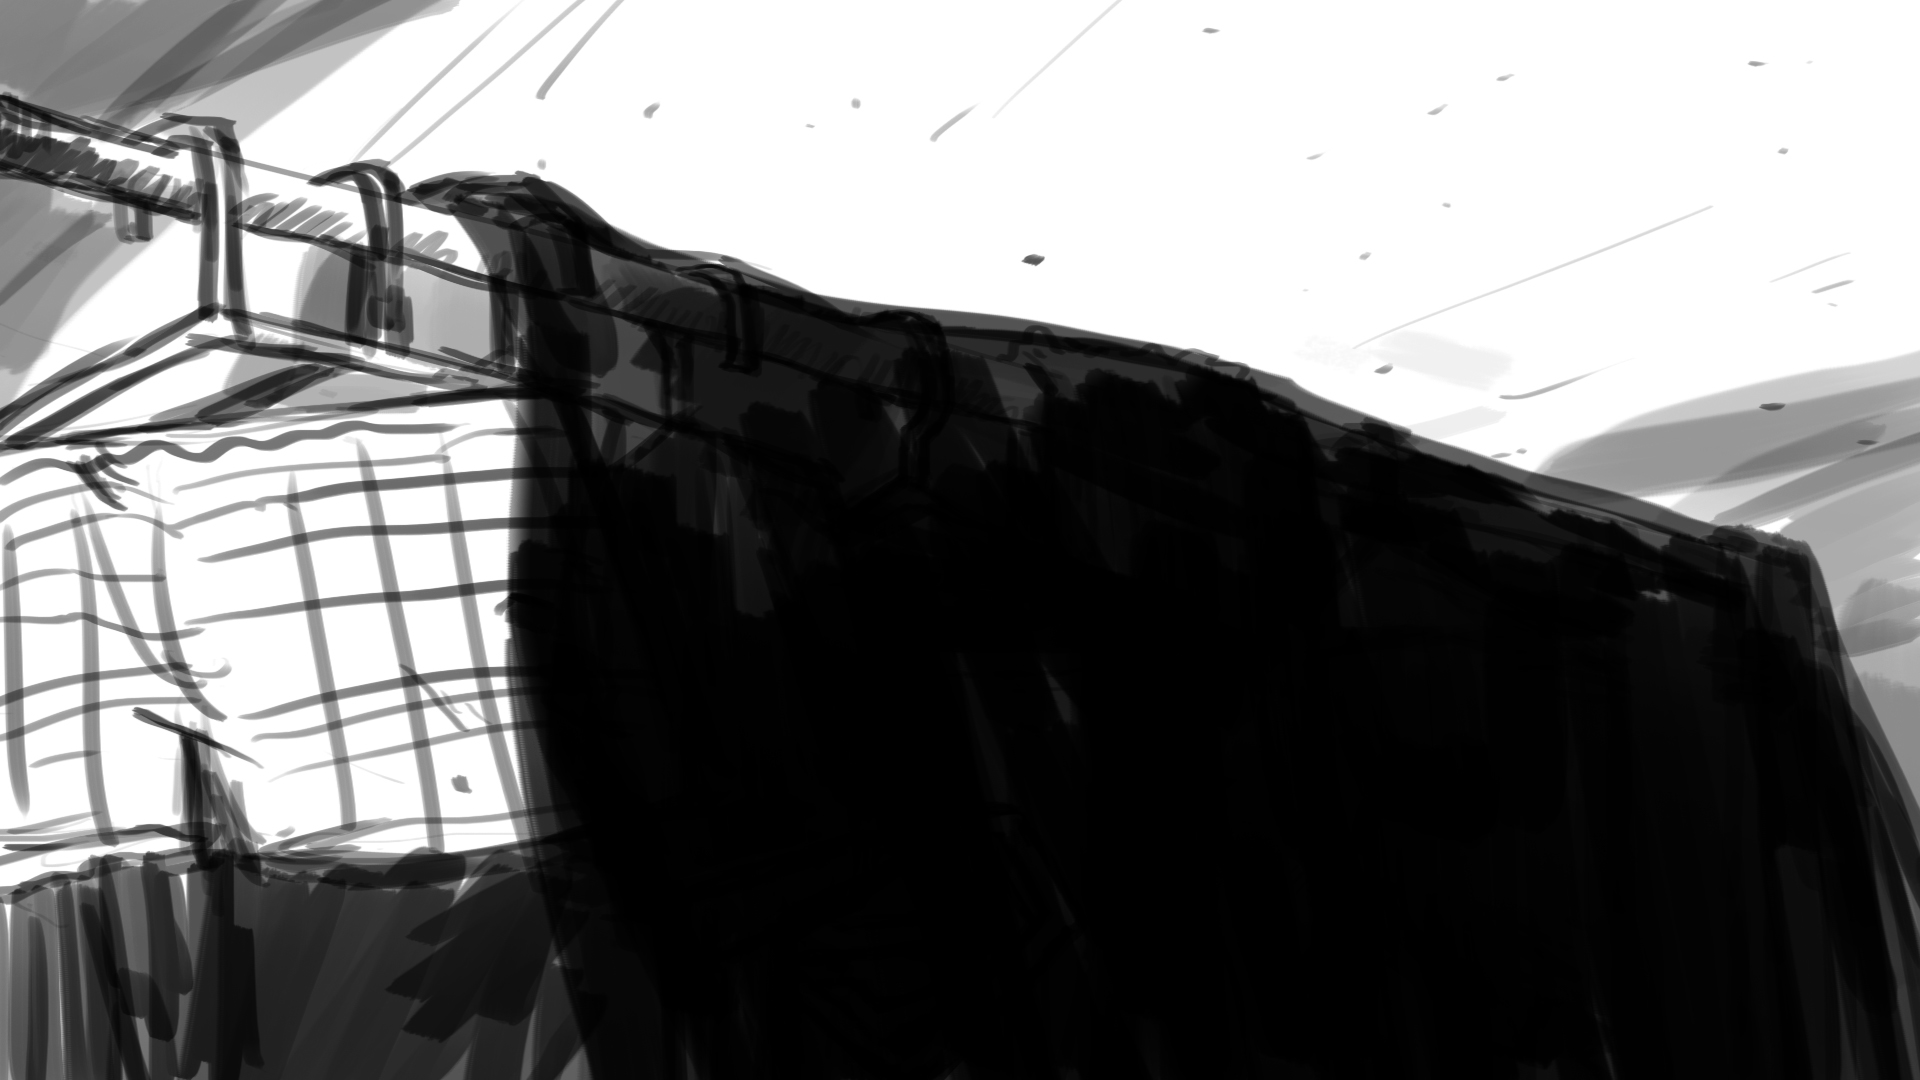 The Kid_Illustration1